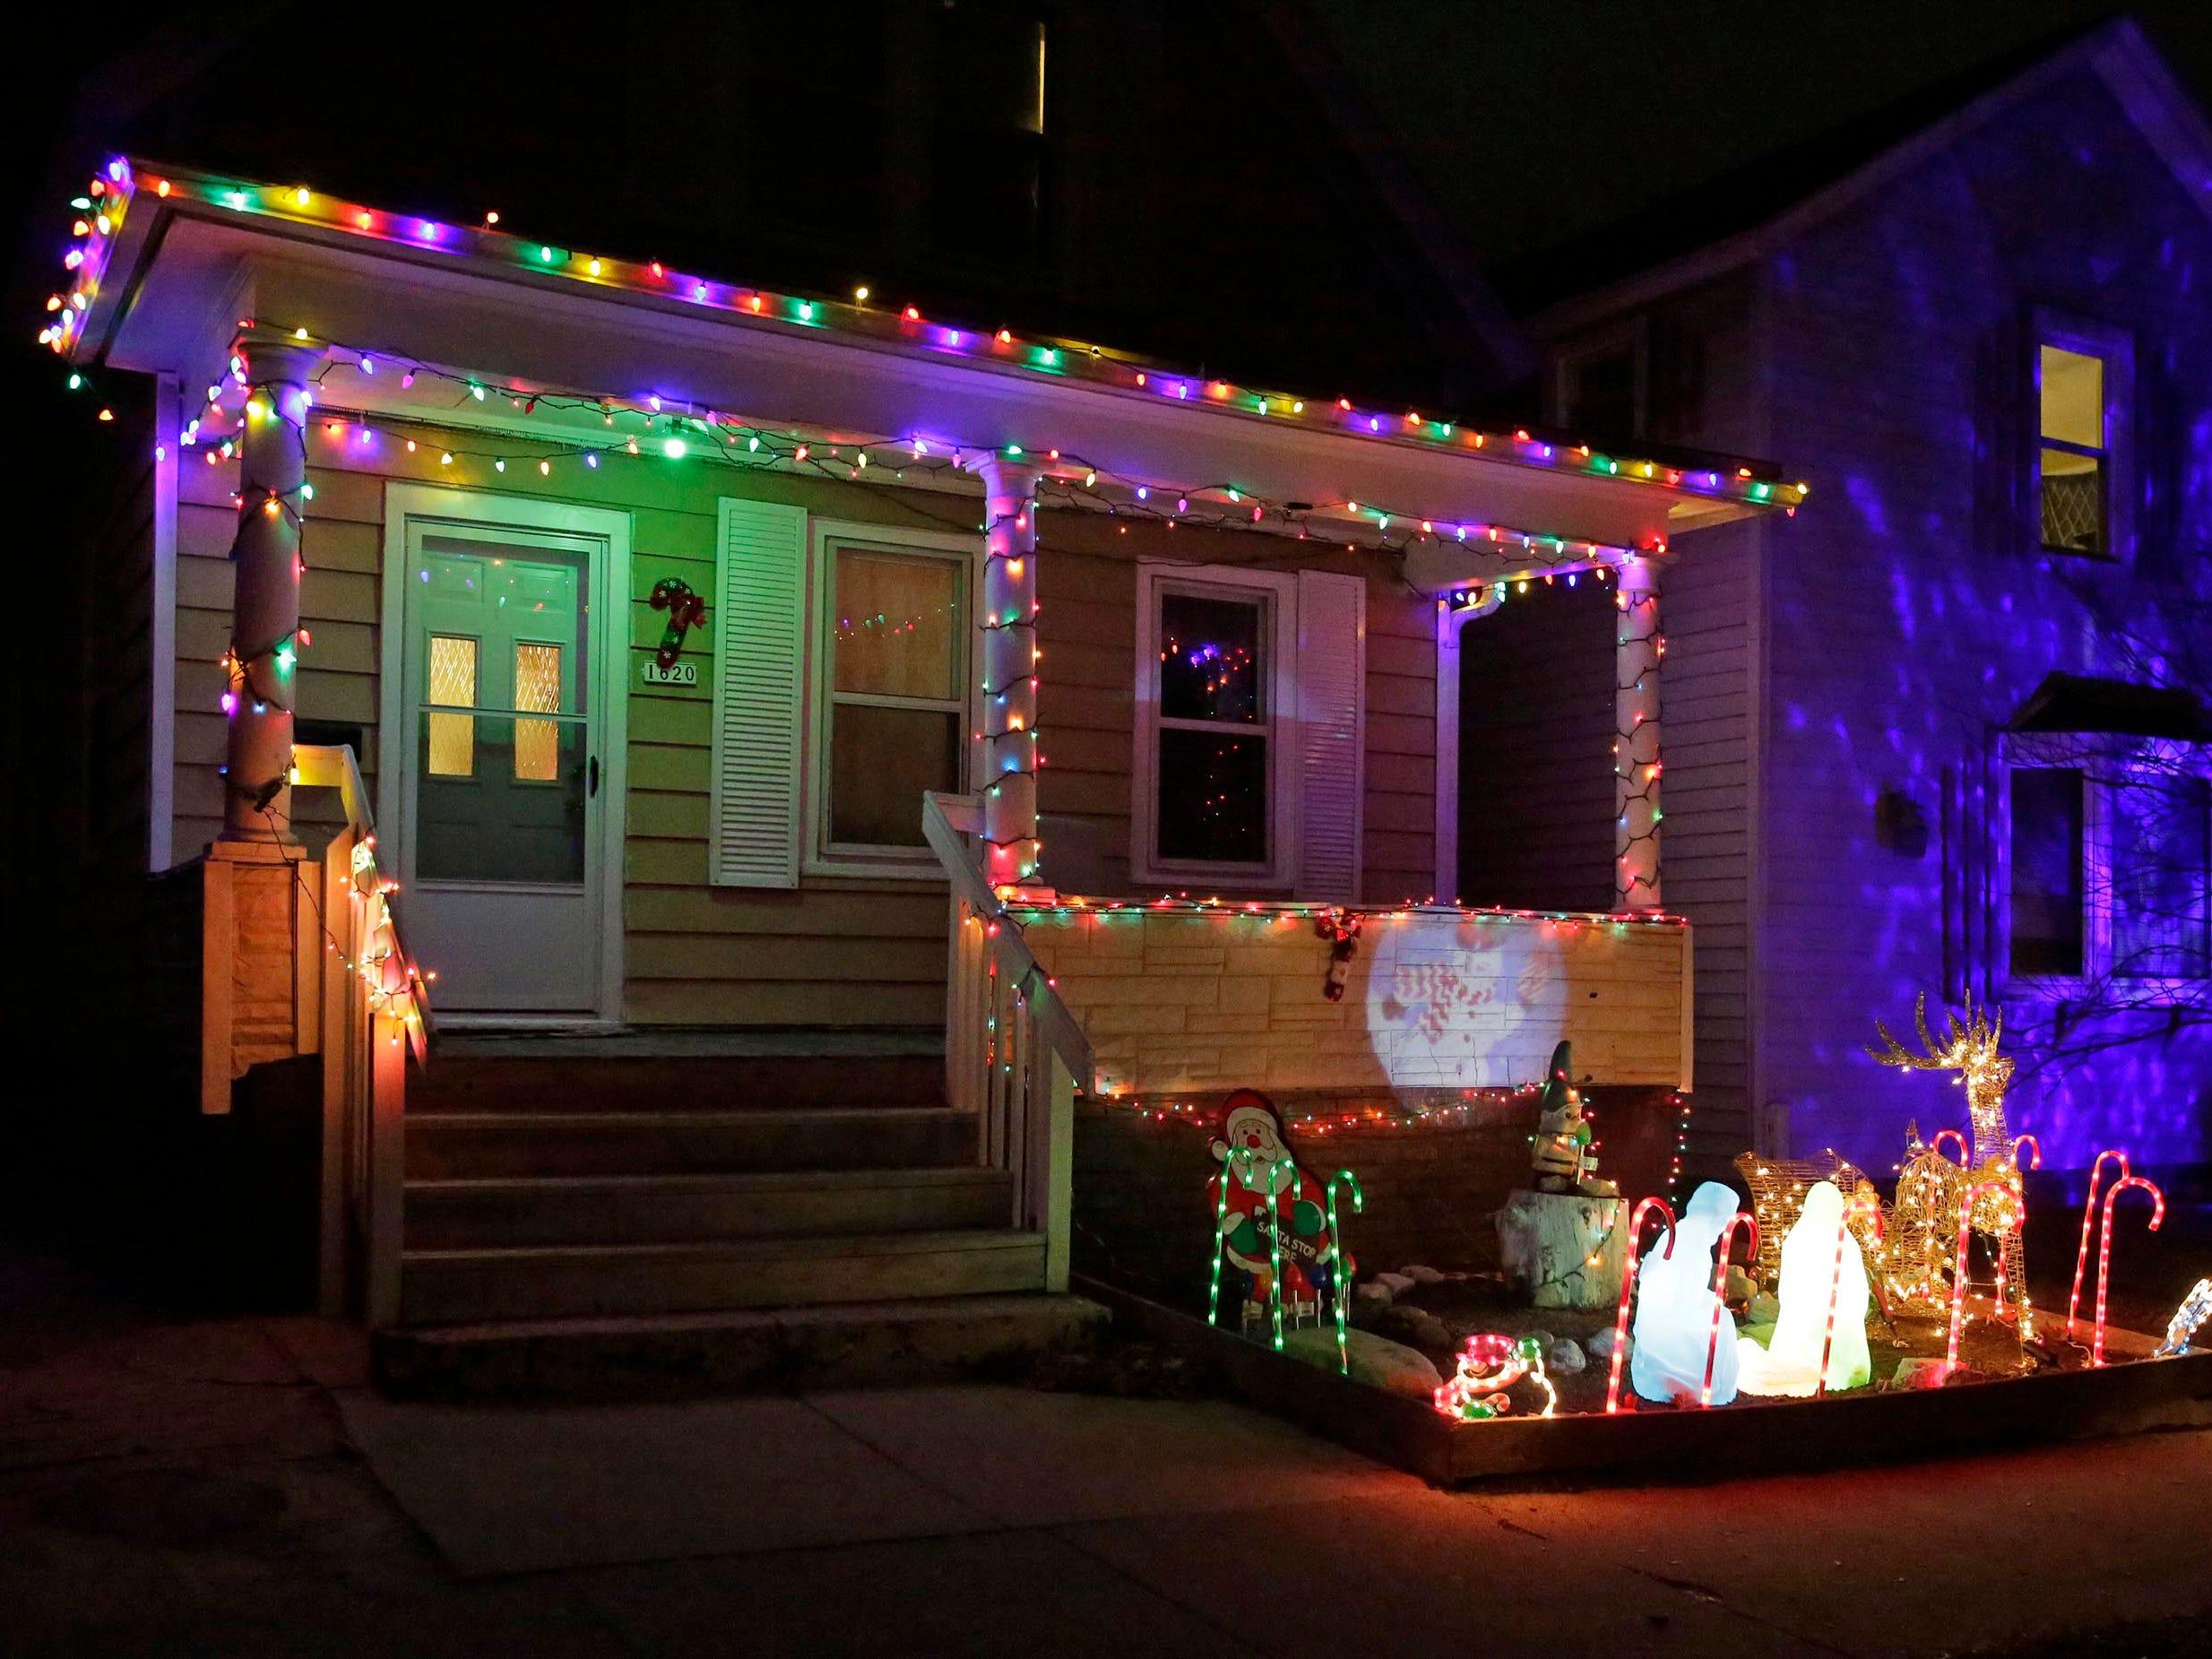 Holiday lights on Superior Avenue, Thursday, December 20, 2018, in Sheboygan, Wis.